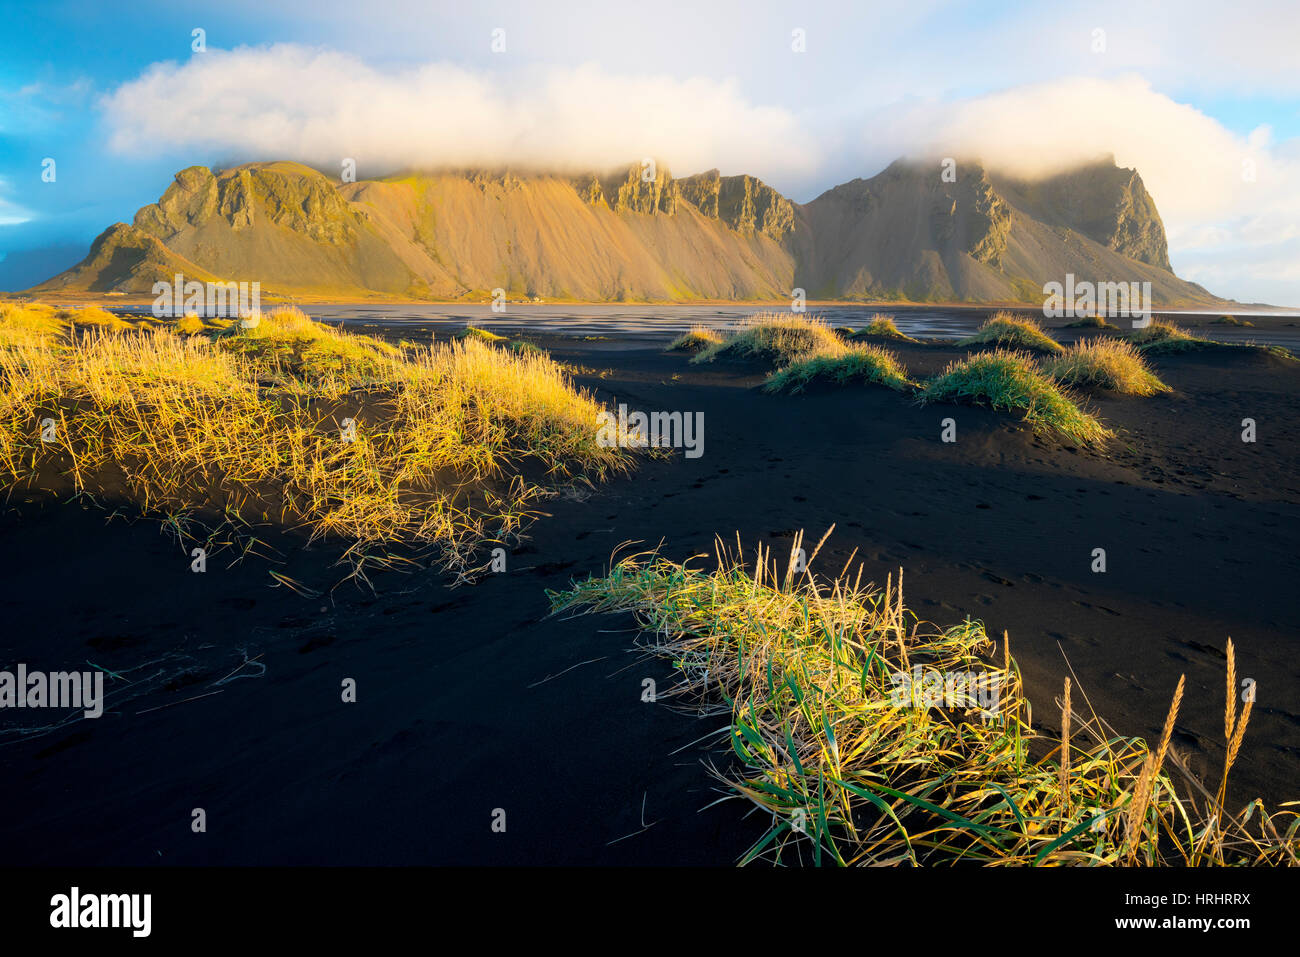 Mount Vestrahorn shrouded in clouds, Stokksnes, Iceland, Polar Regions - Stock Image